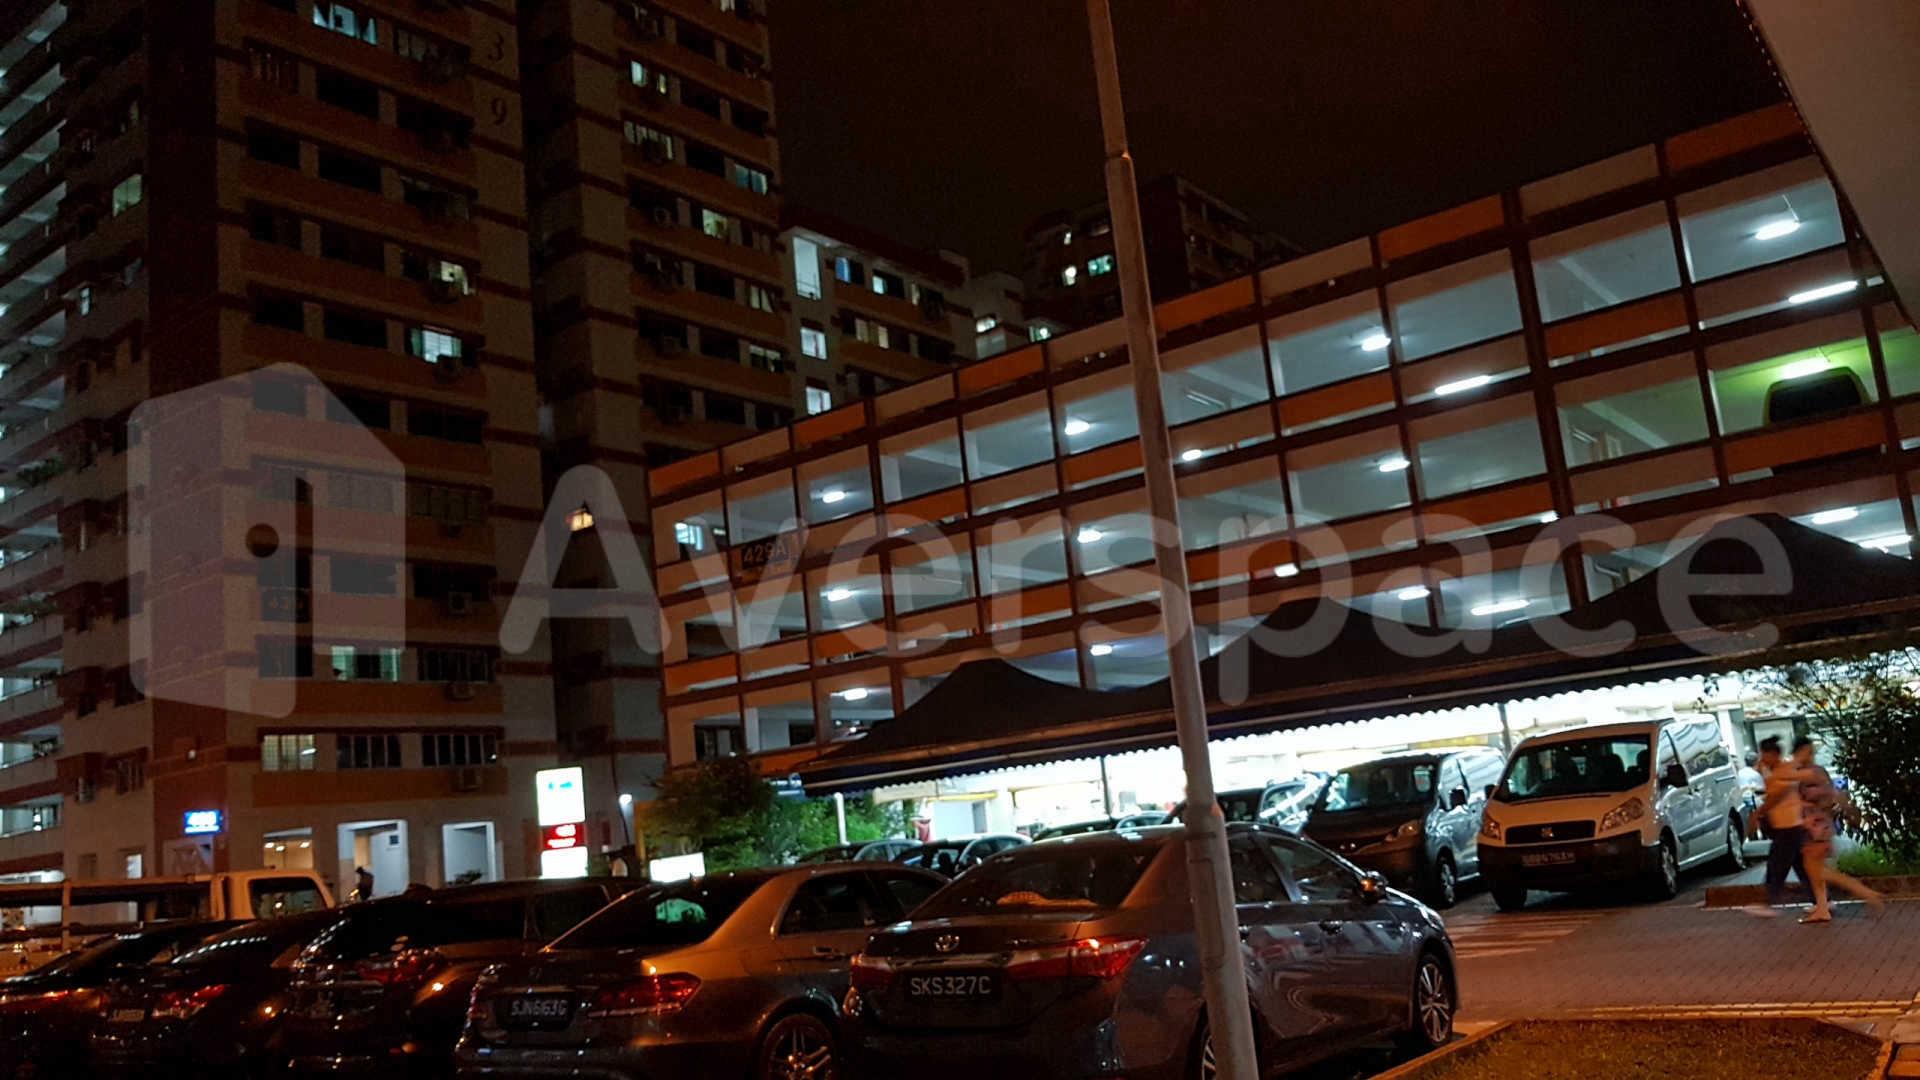 439 Choa Chu Kang Avenue 4, District 23 Singapore